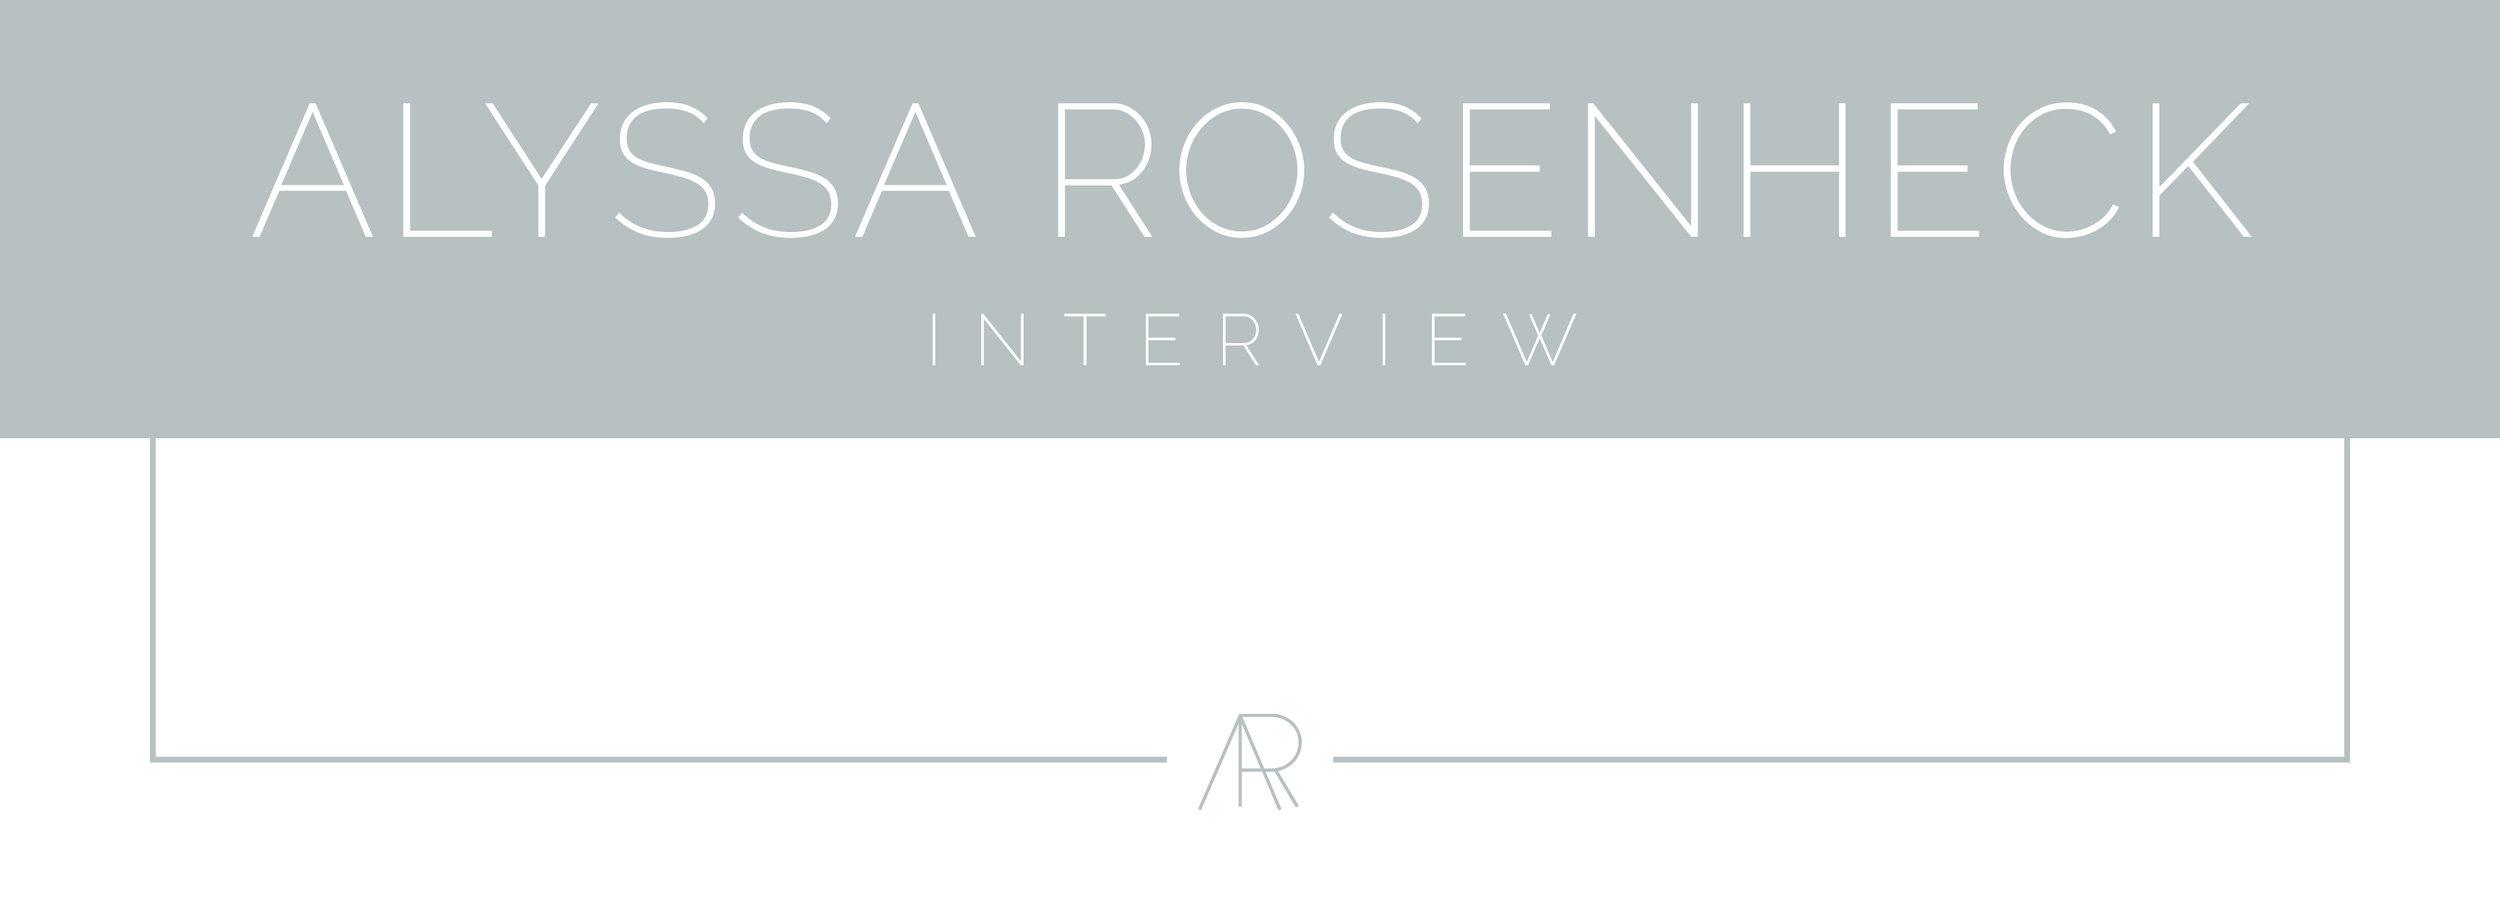 Alyssa Rosenheck Photographer and Nashville Singer Songwriter Sarah Anne Davidson with Caroline Hobby on The Get Real Podcast